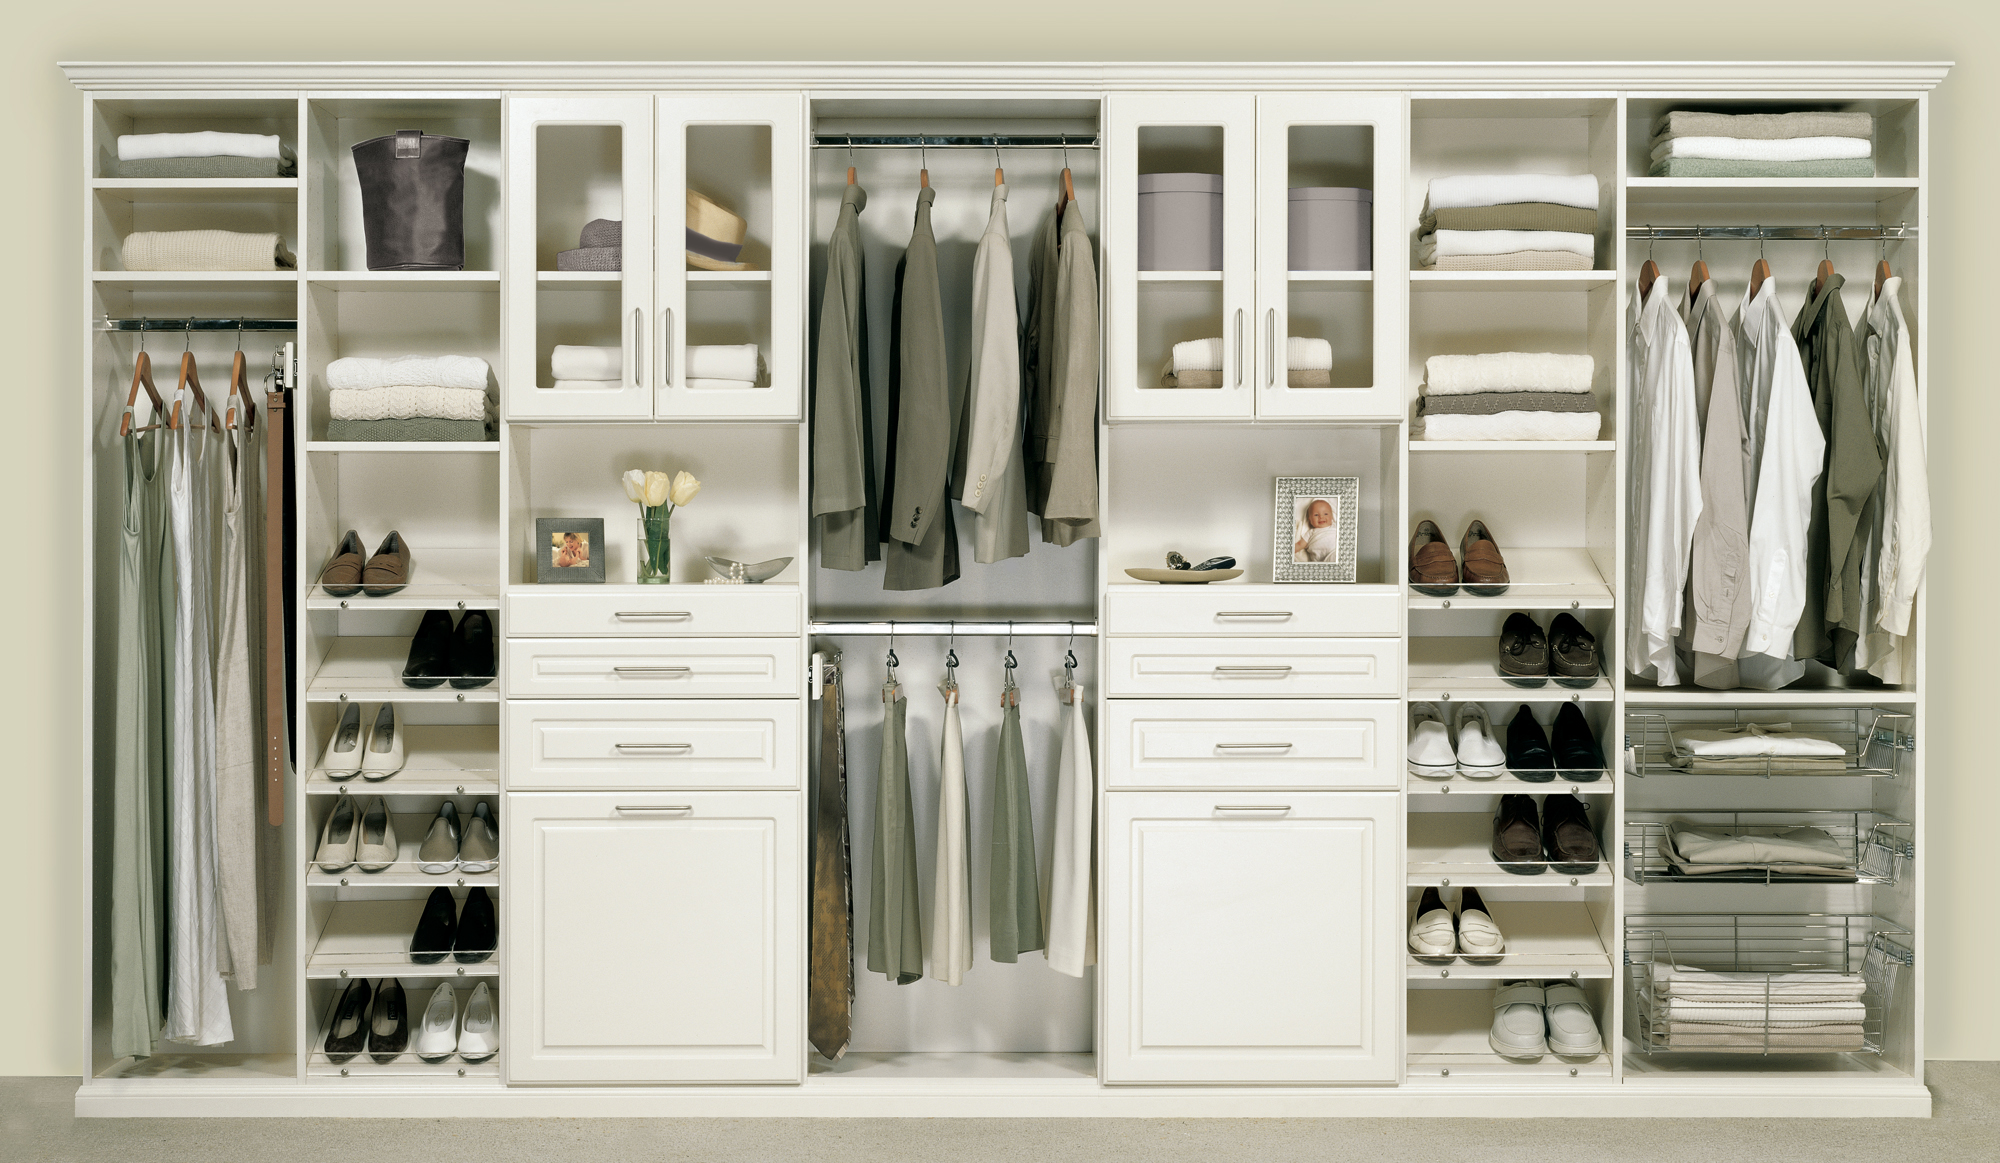 walk-in-closet-construction-plans-photo-6